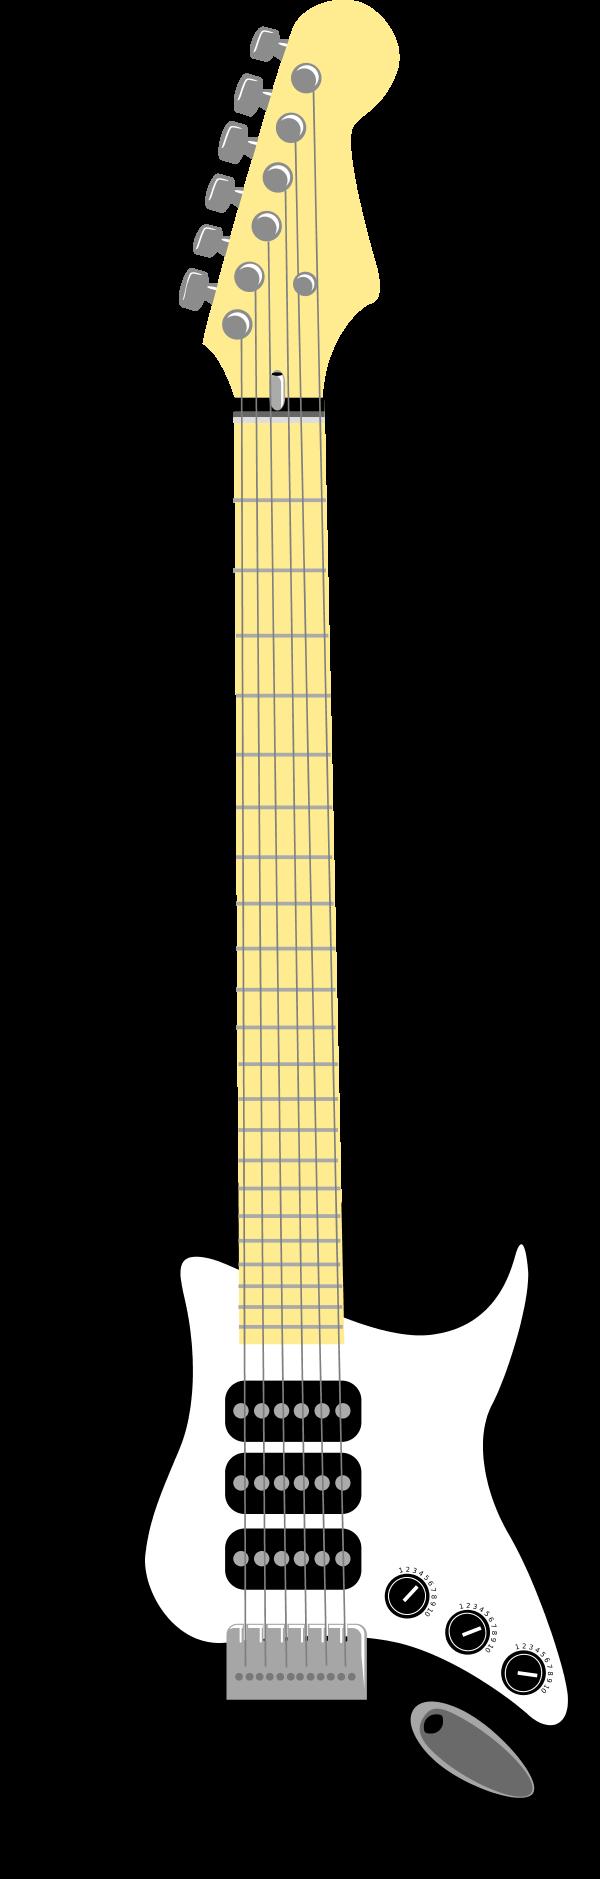 Black and white panda. Clipart guitar electric guitar